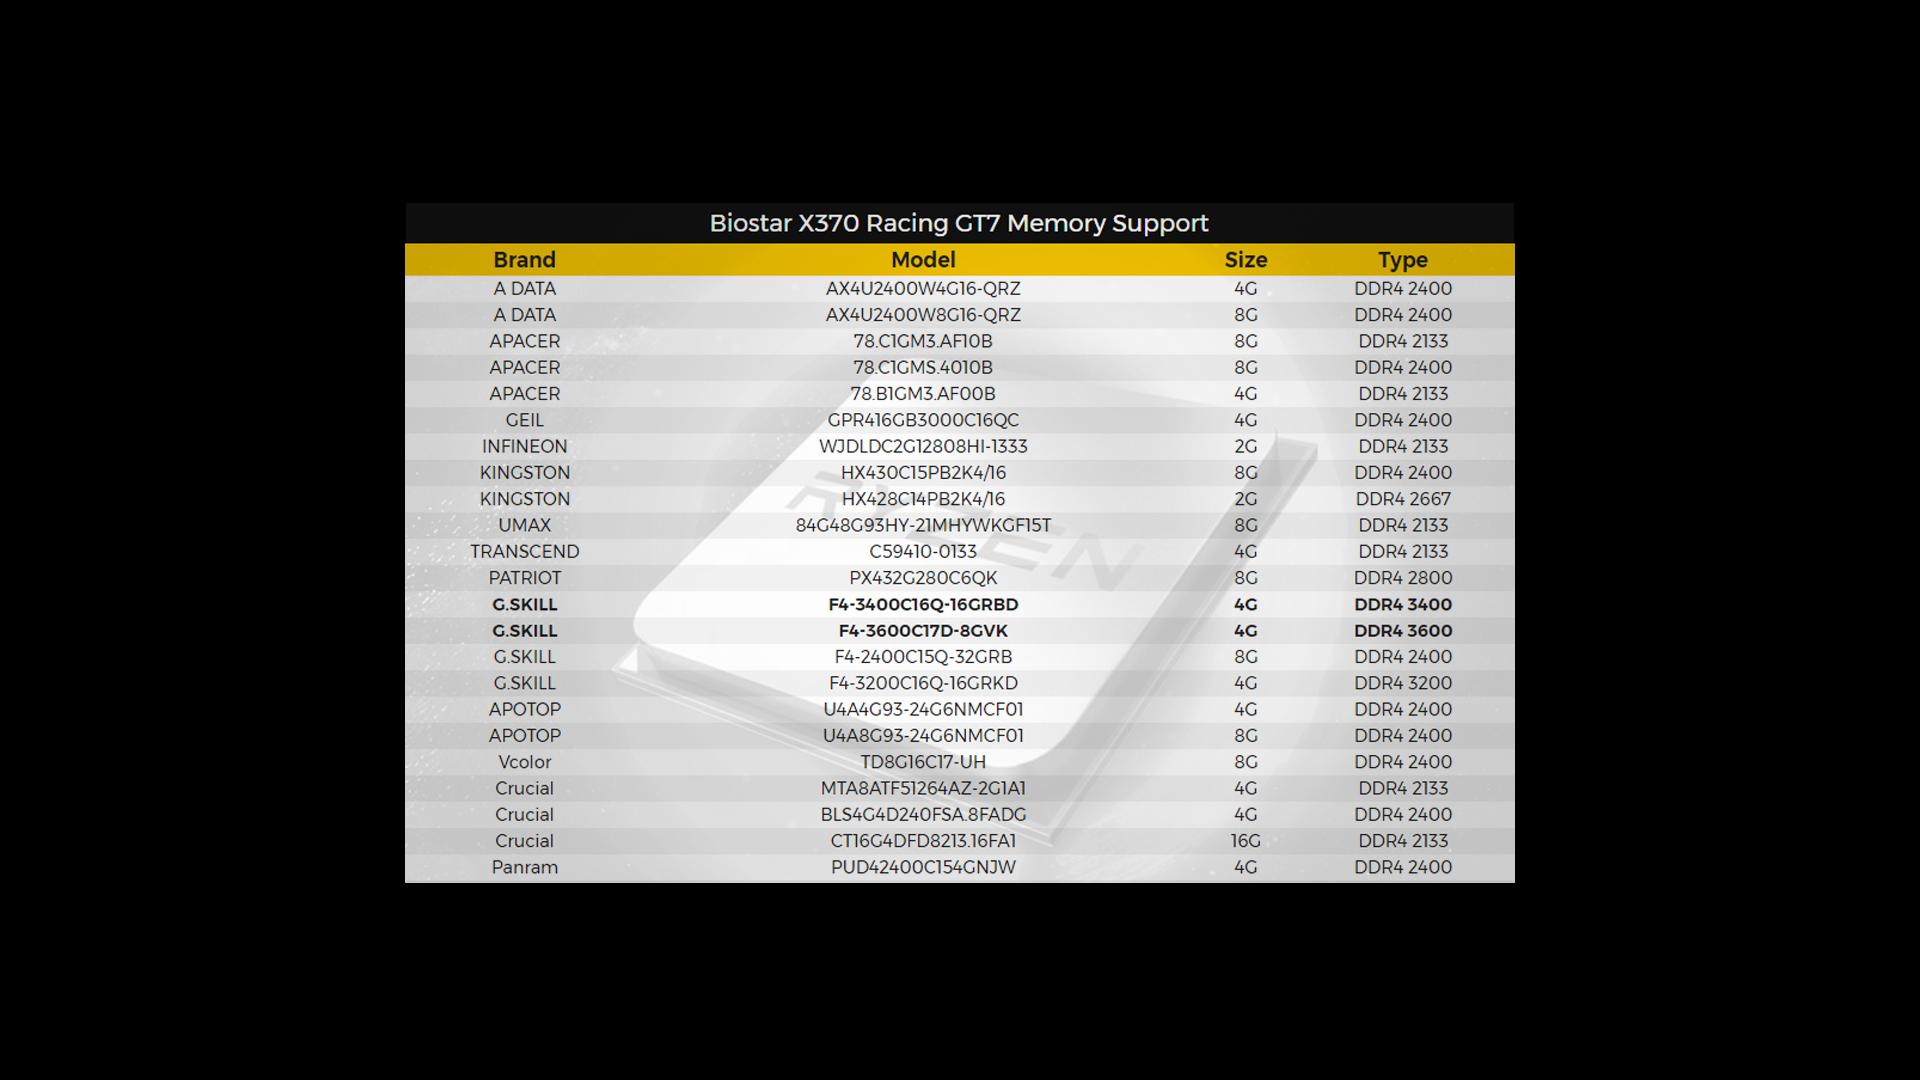 Soporte de memorias de: Biostar X370 Racing GT7 | BIOSTAR